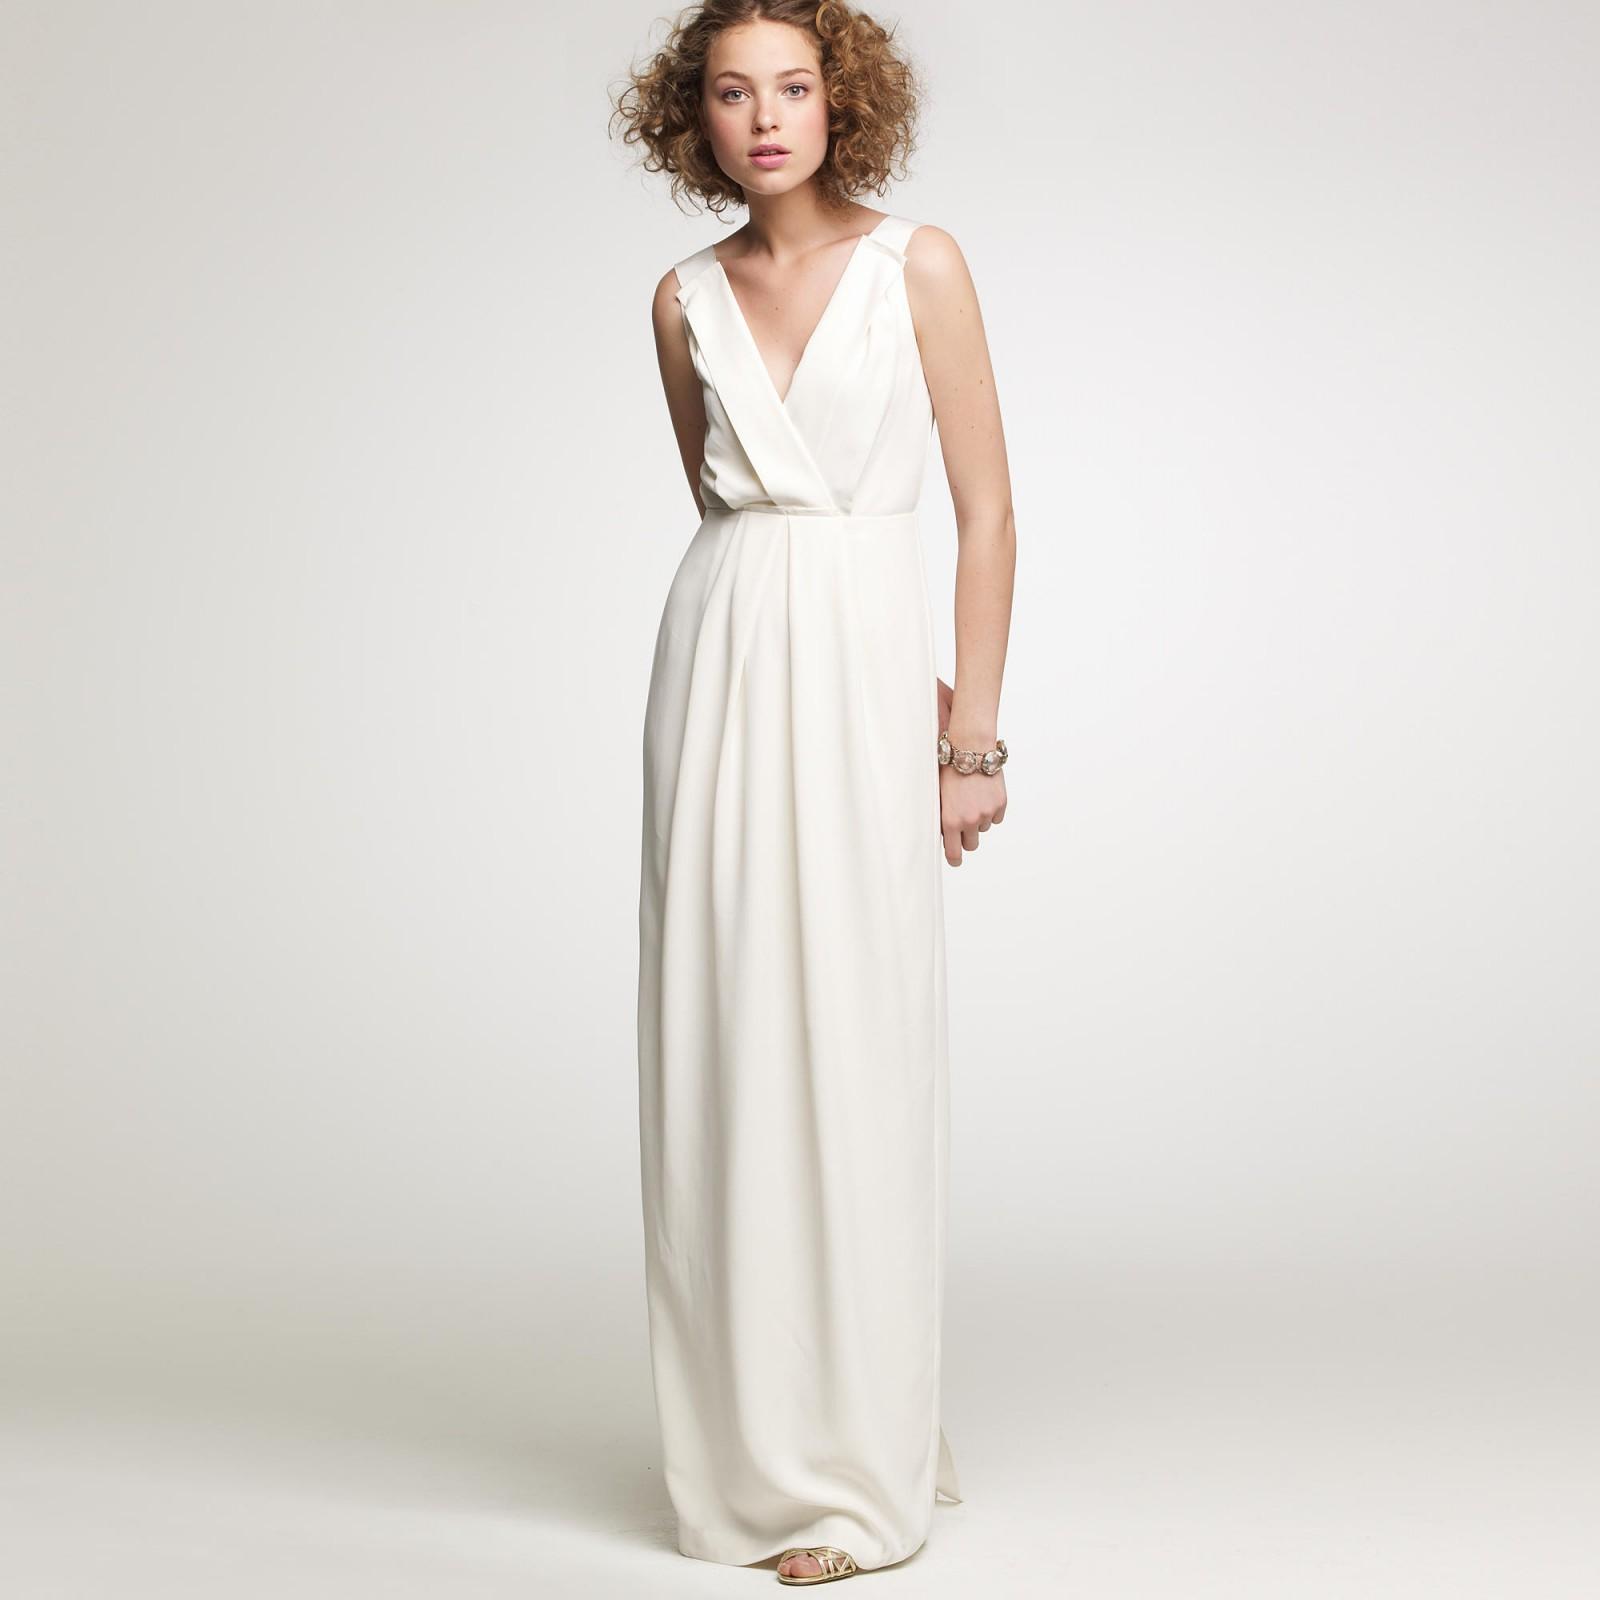 J Crew Wedding Dress.J Crew New Aveline Size 12